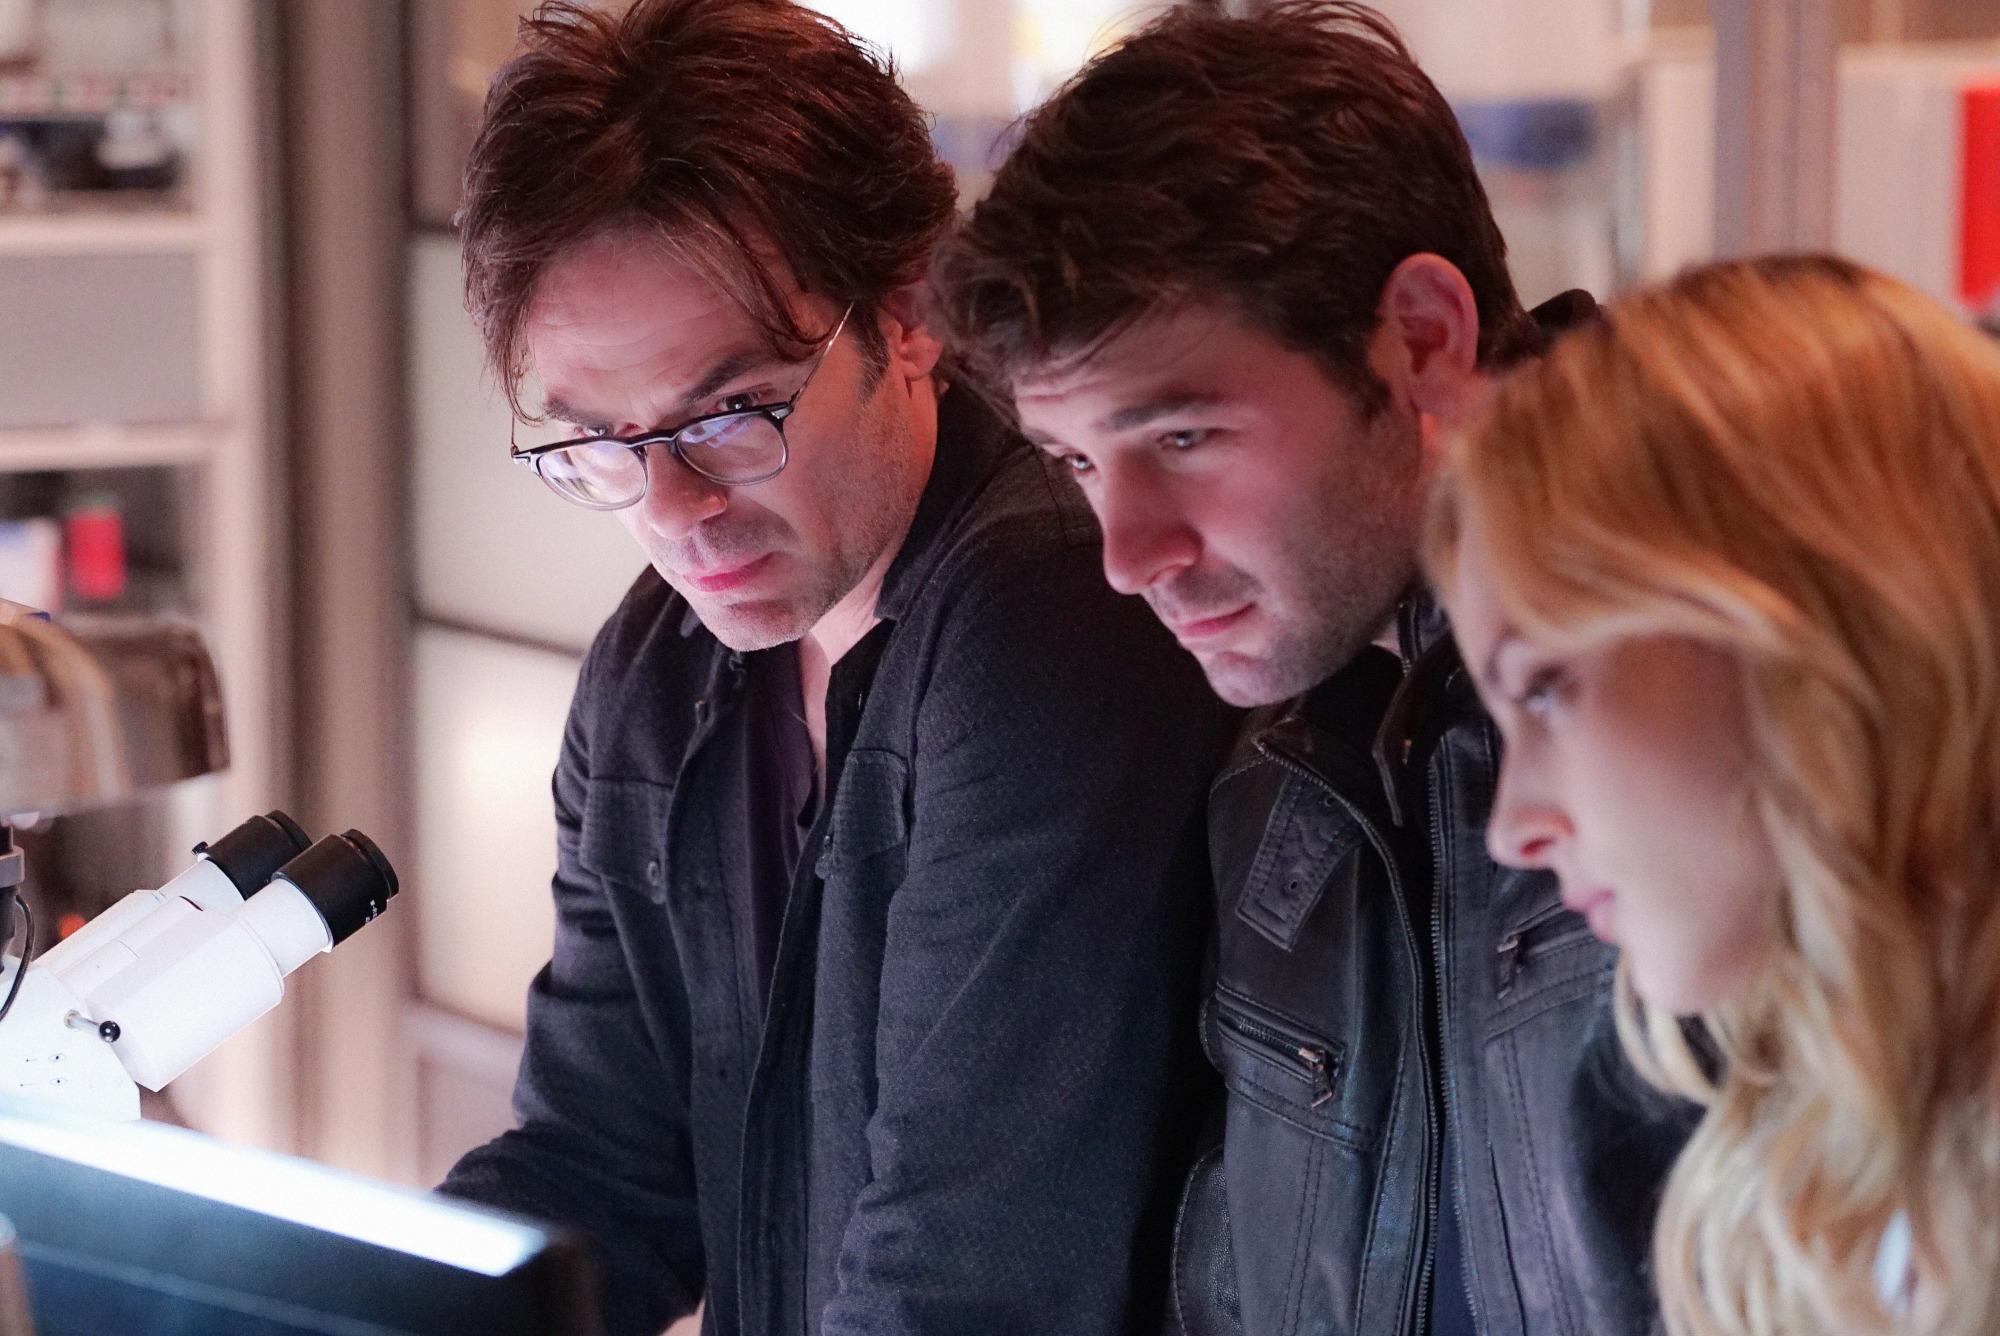 Mitch, Jackson, and Chloe ponder their next move.